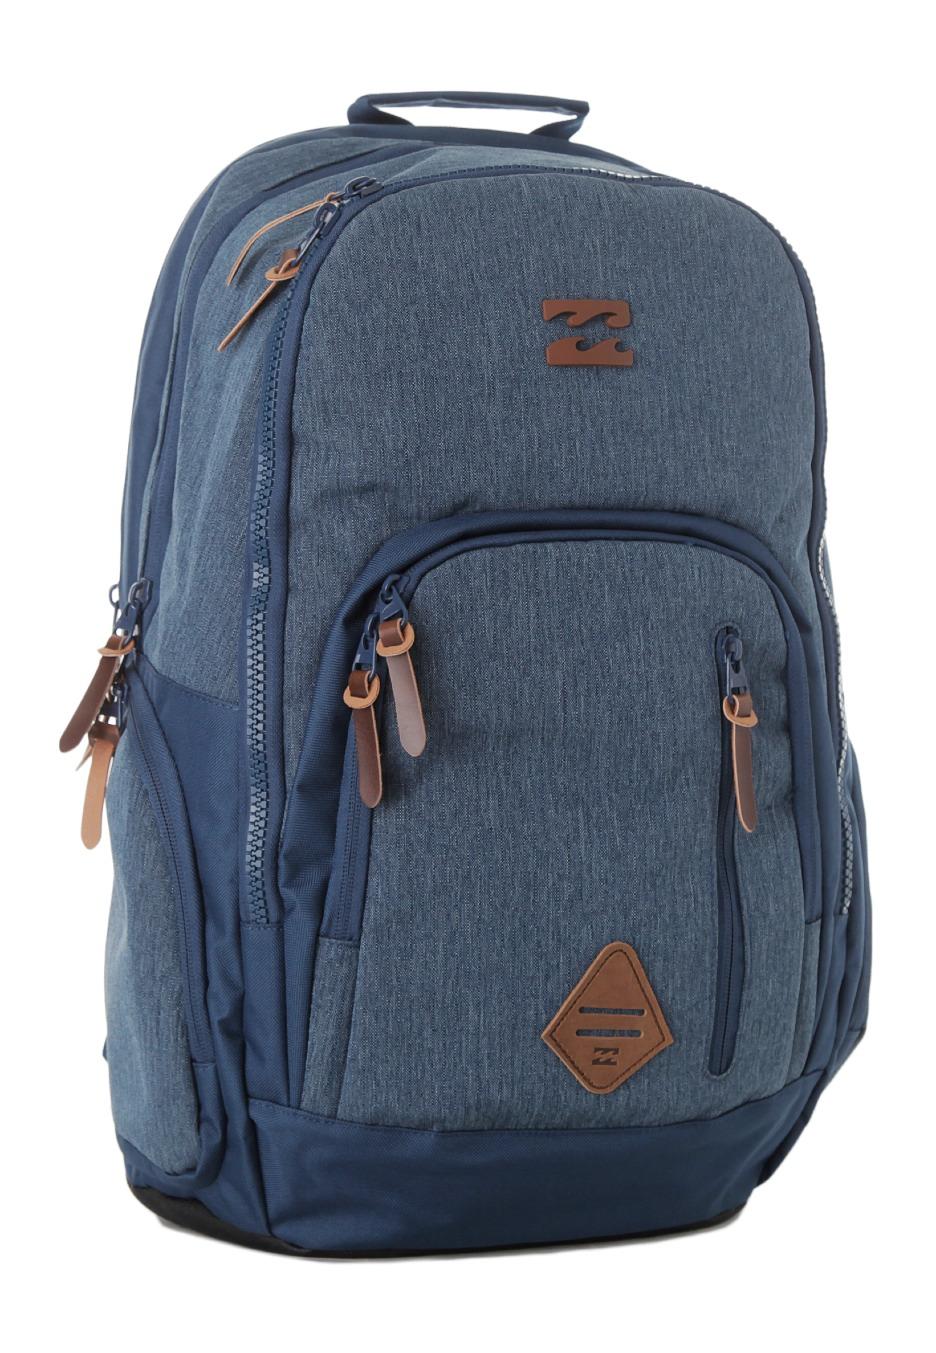 0da2034be24c Billabong - Command Marine - Backpack - Streetwear Shop - Impericon.com US